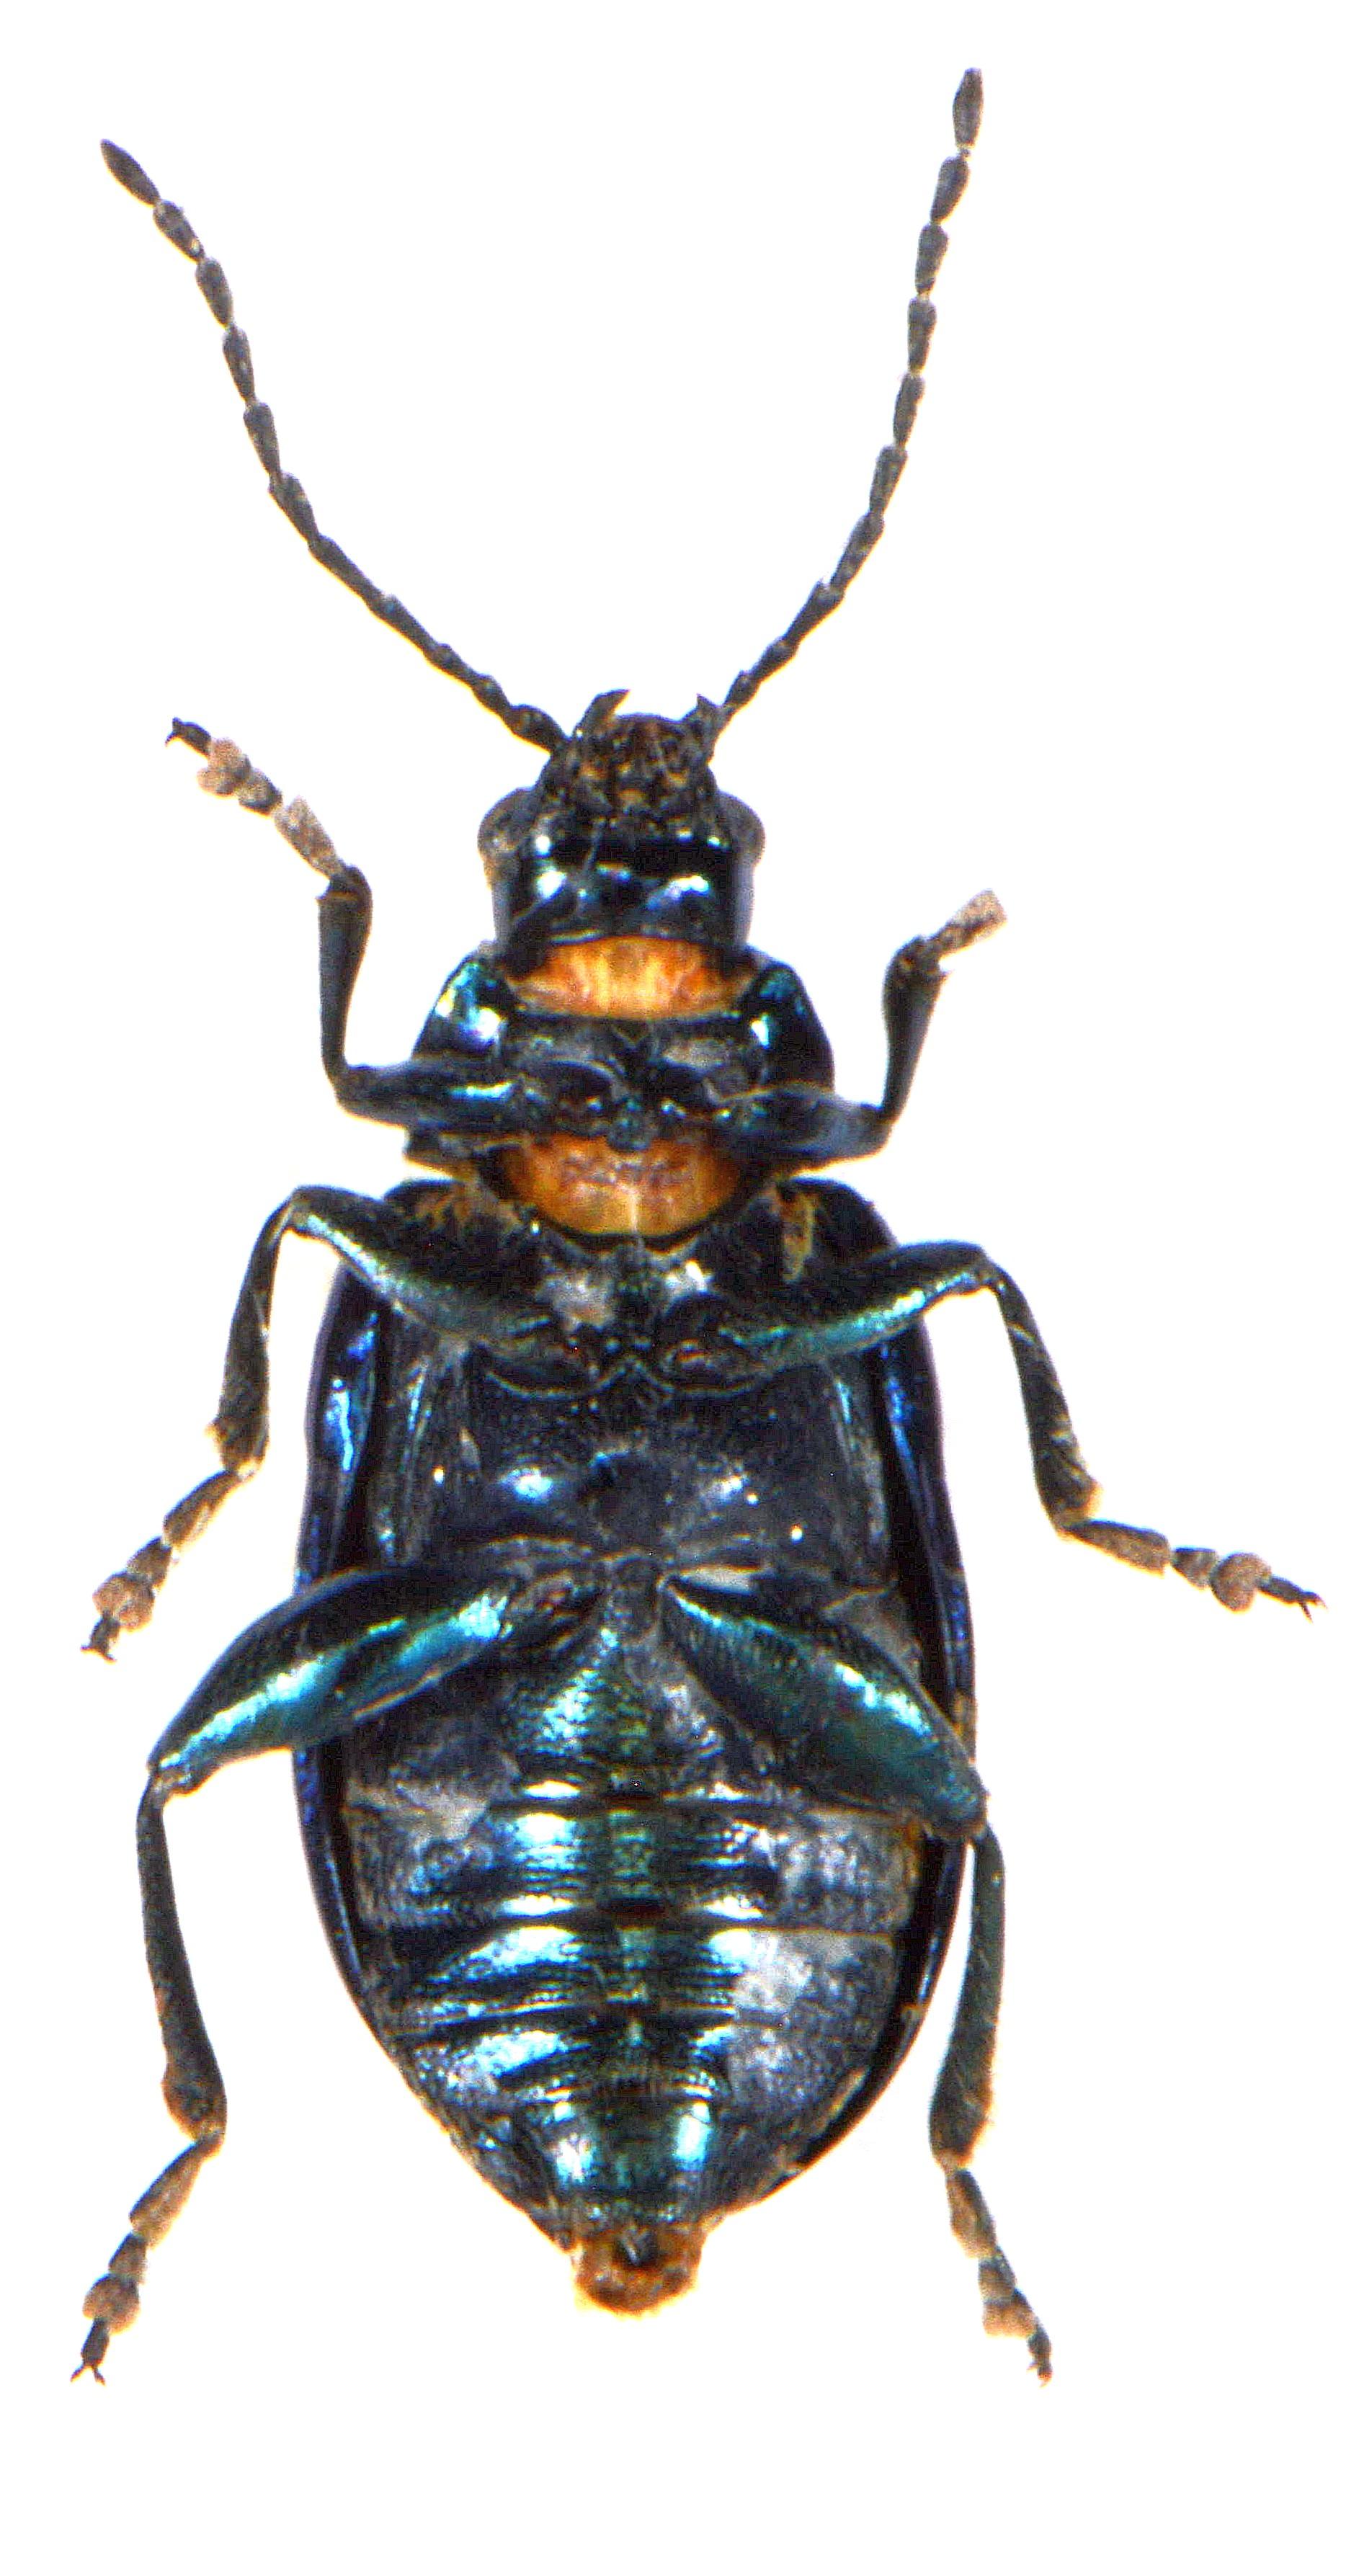 Altica lythri 4